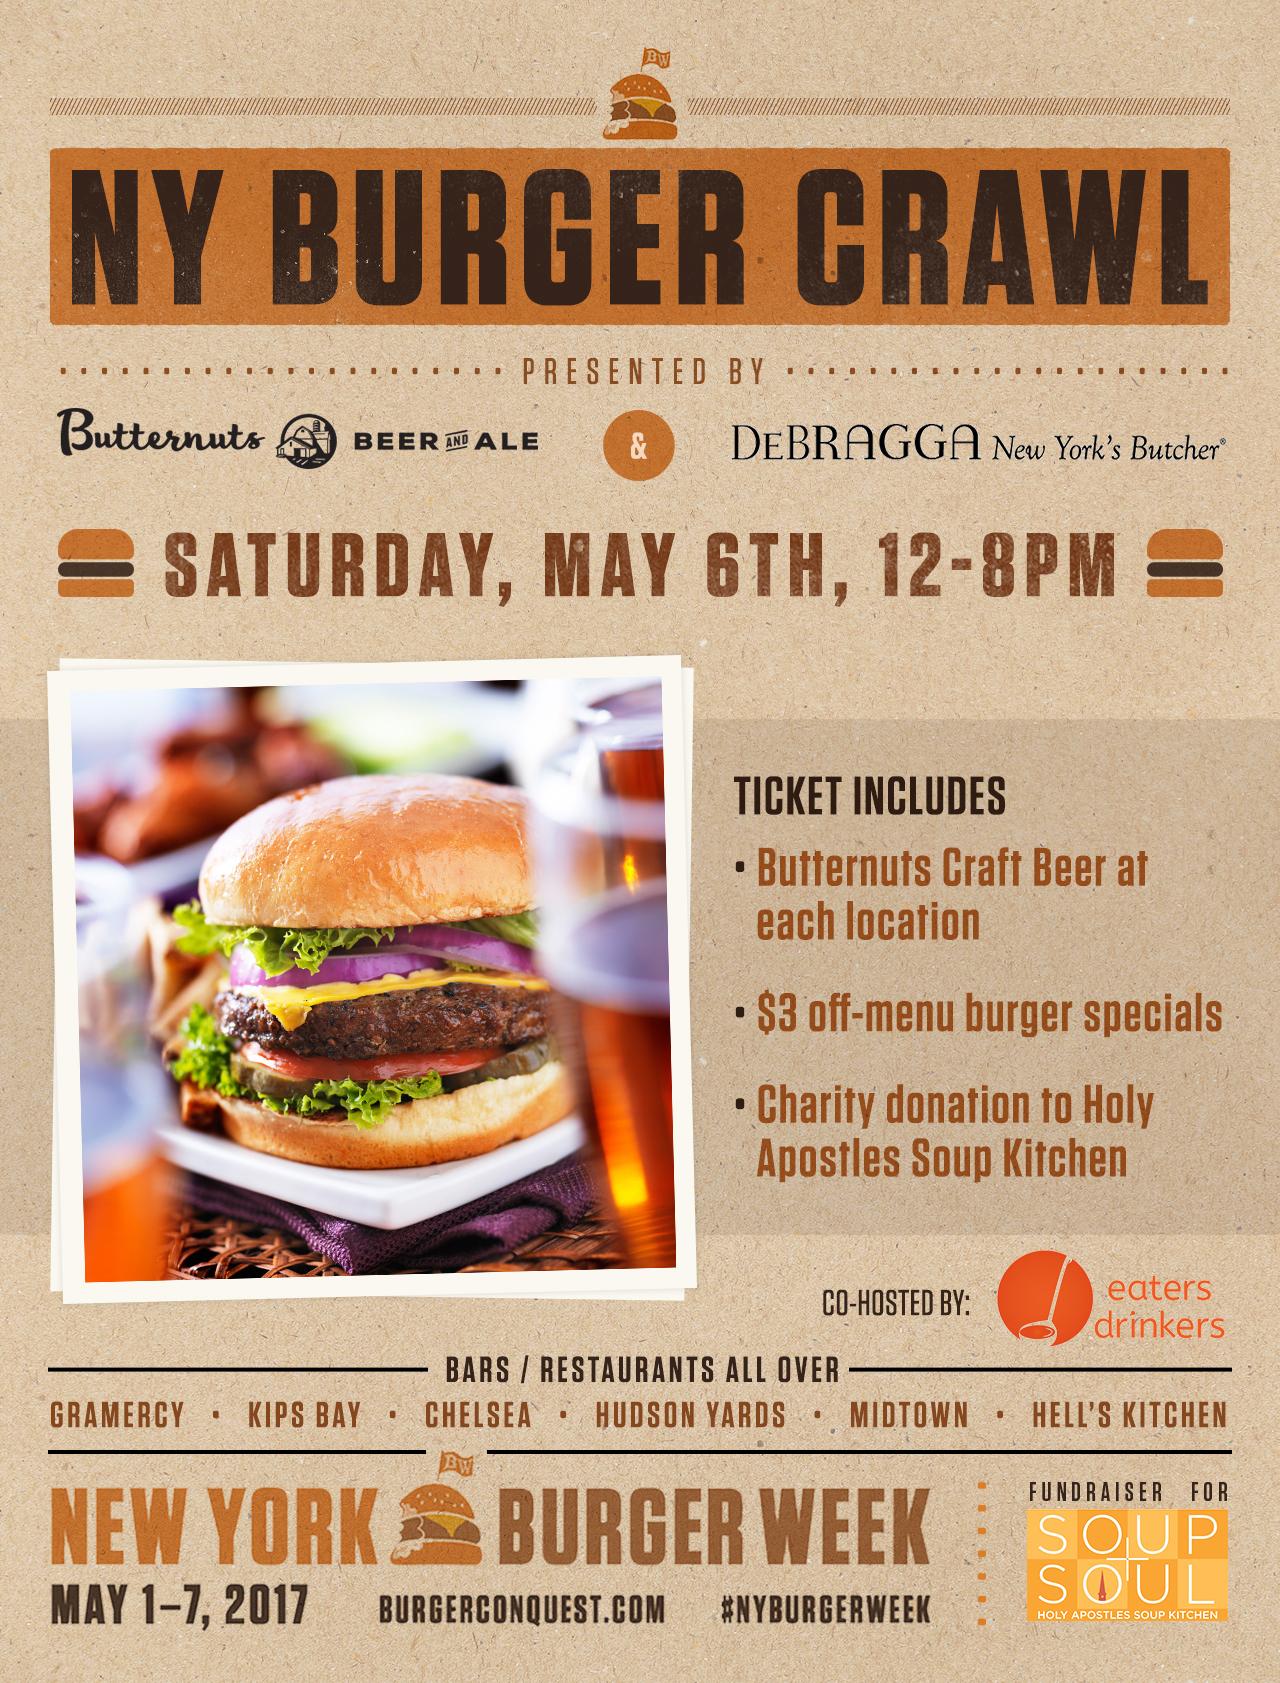 ny burger crawl presented by debragga new york u0027s butcher and